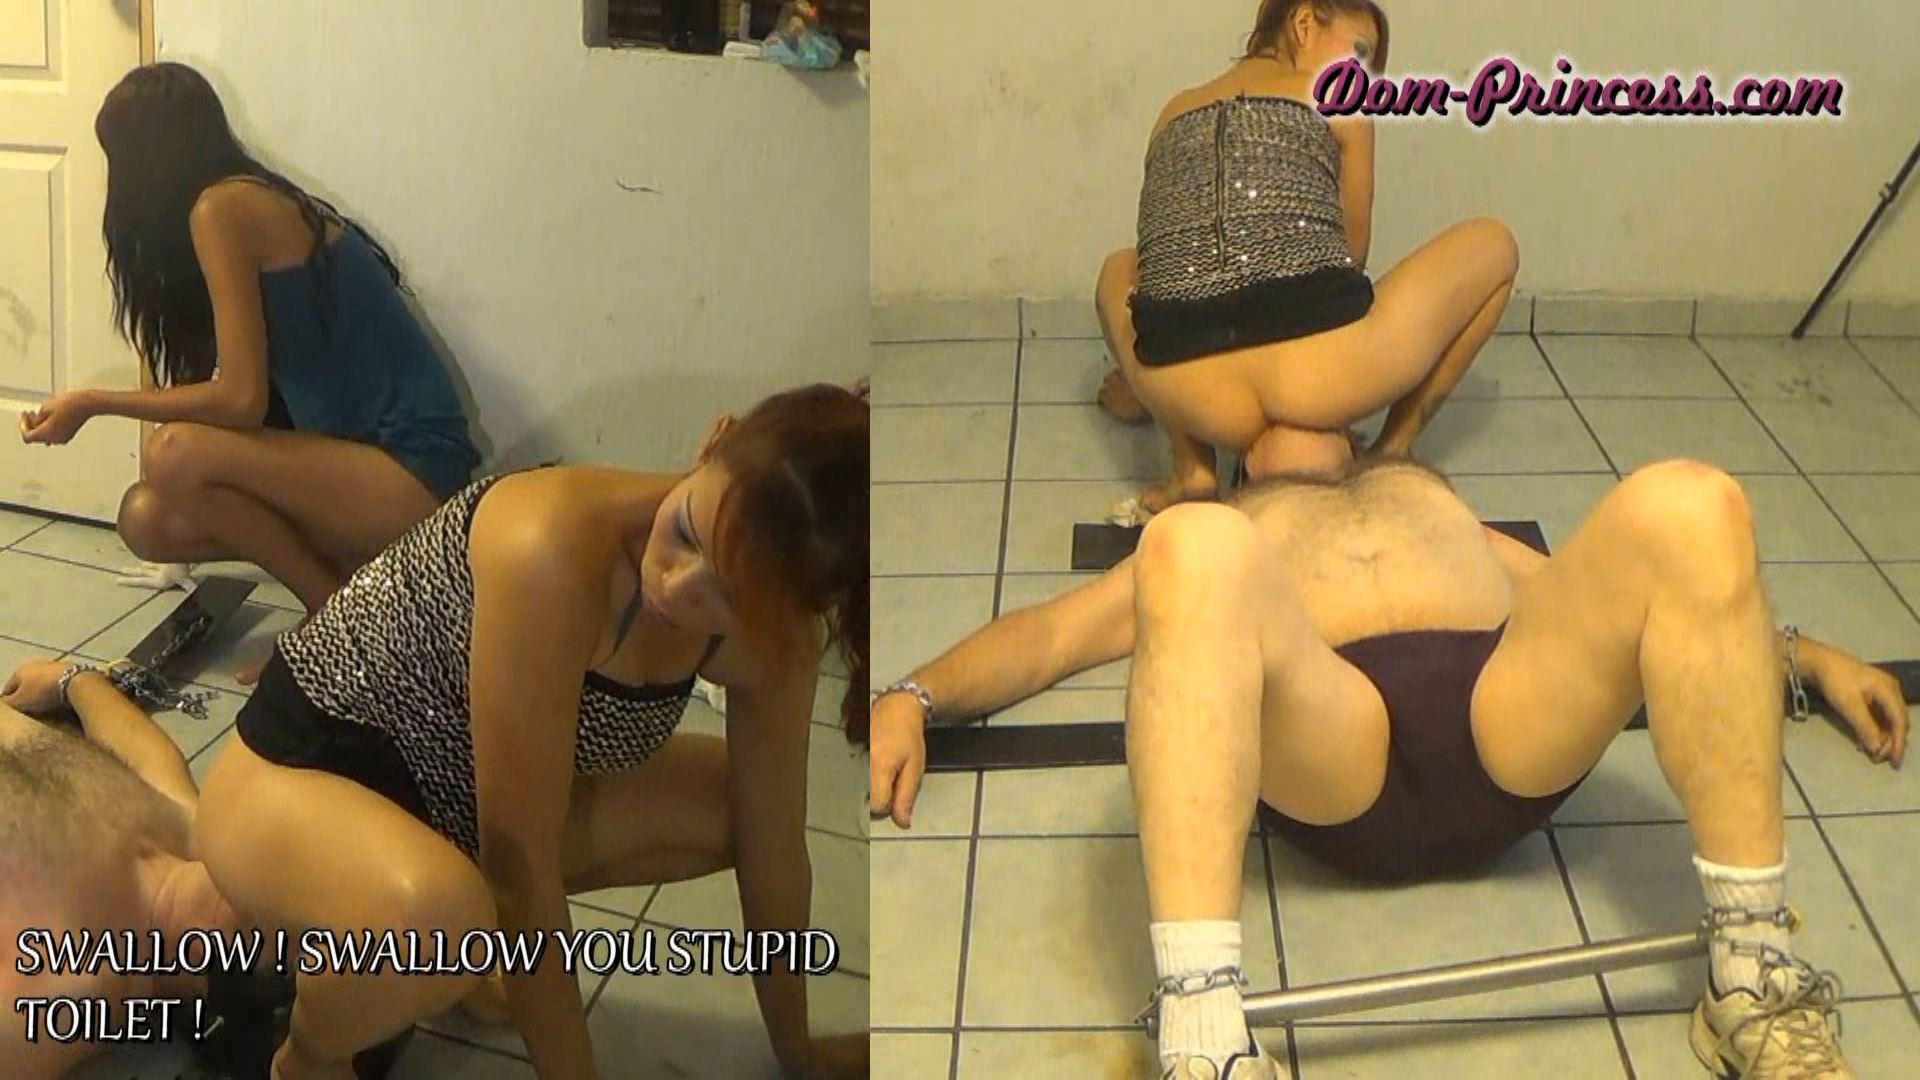 [SCAT-PRINCESS] Sit on Mouth Push Transaction Part 4 Christine [FULL HD][1080p][WMV]